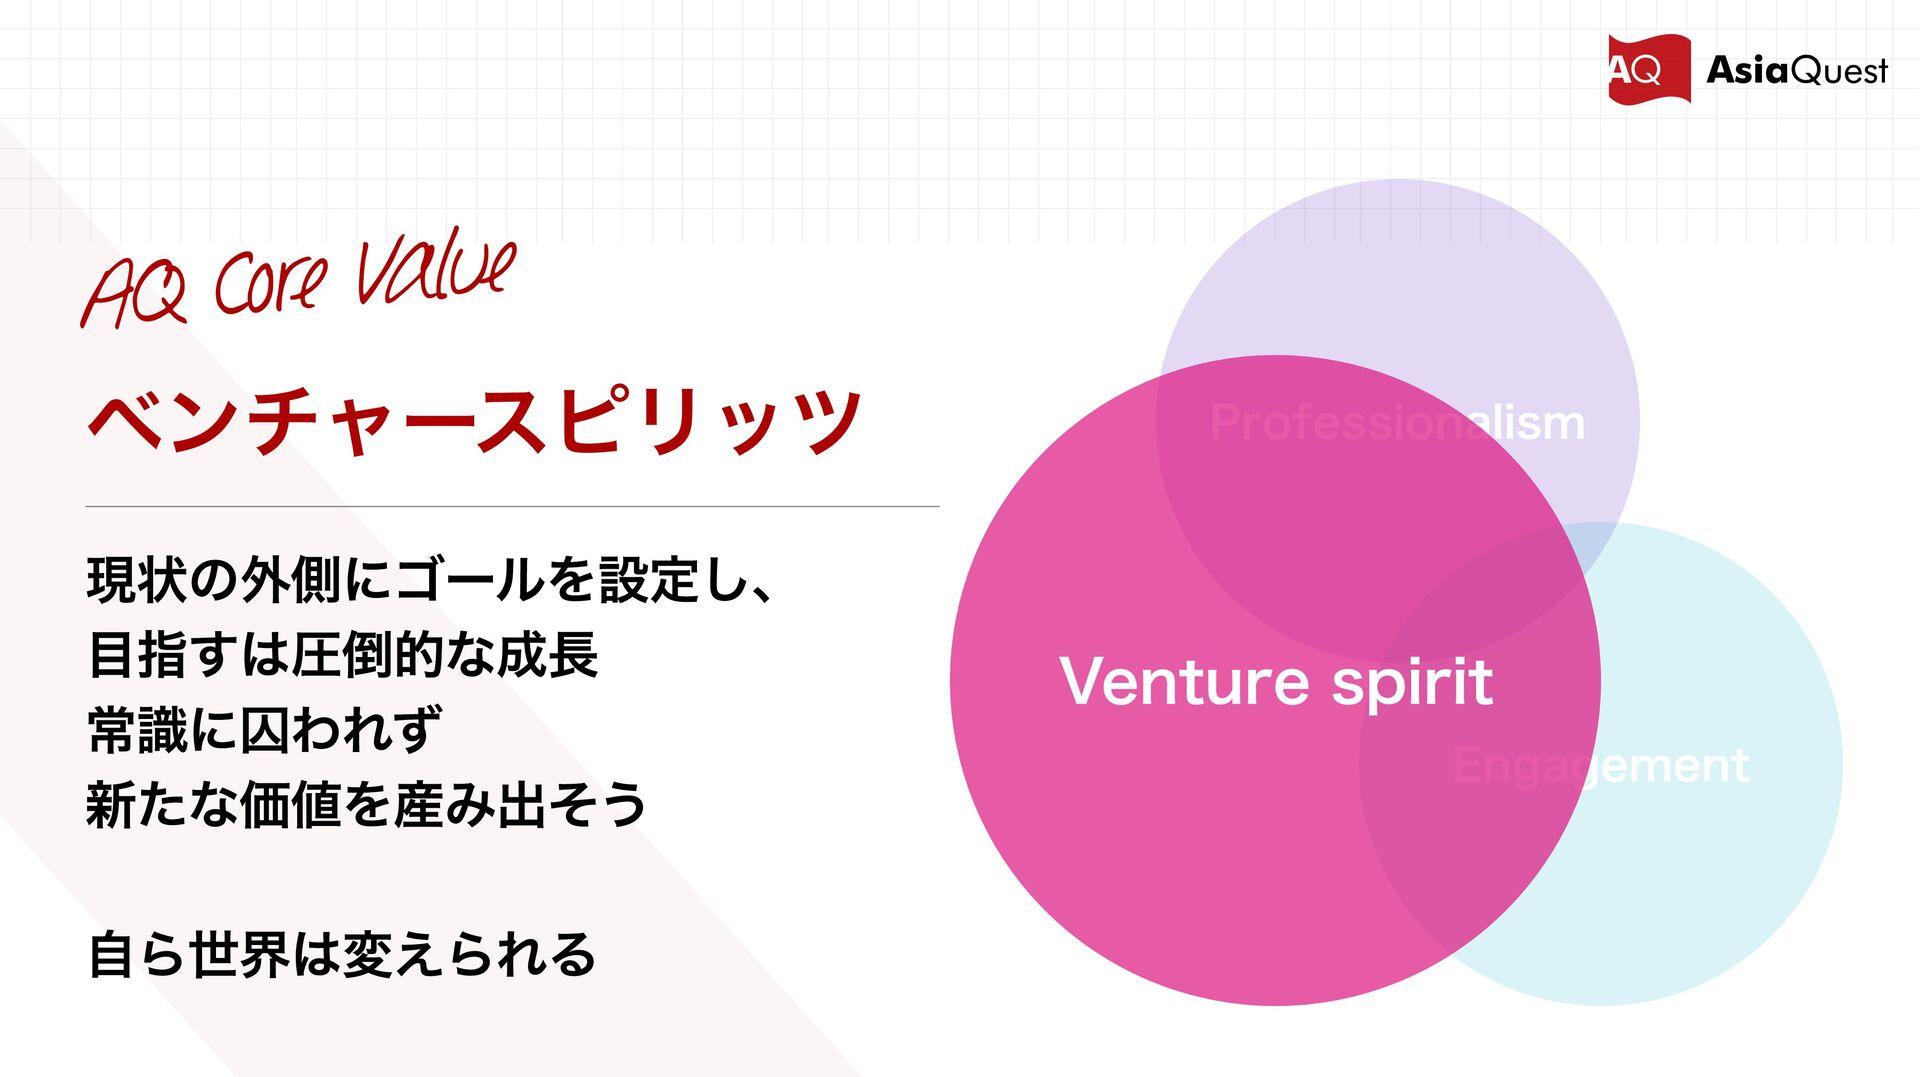 ShainRyoko BASEBALL TEAM JIBIKIAMI Footsal Club